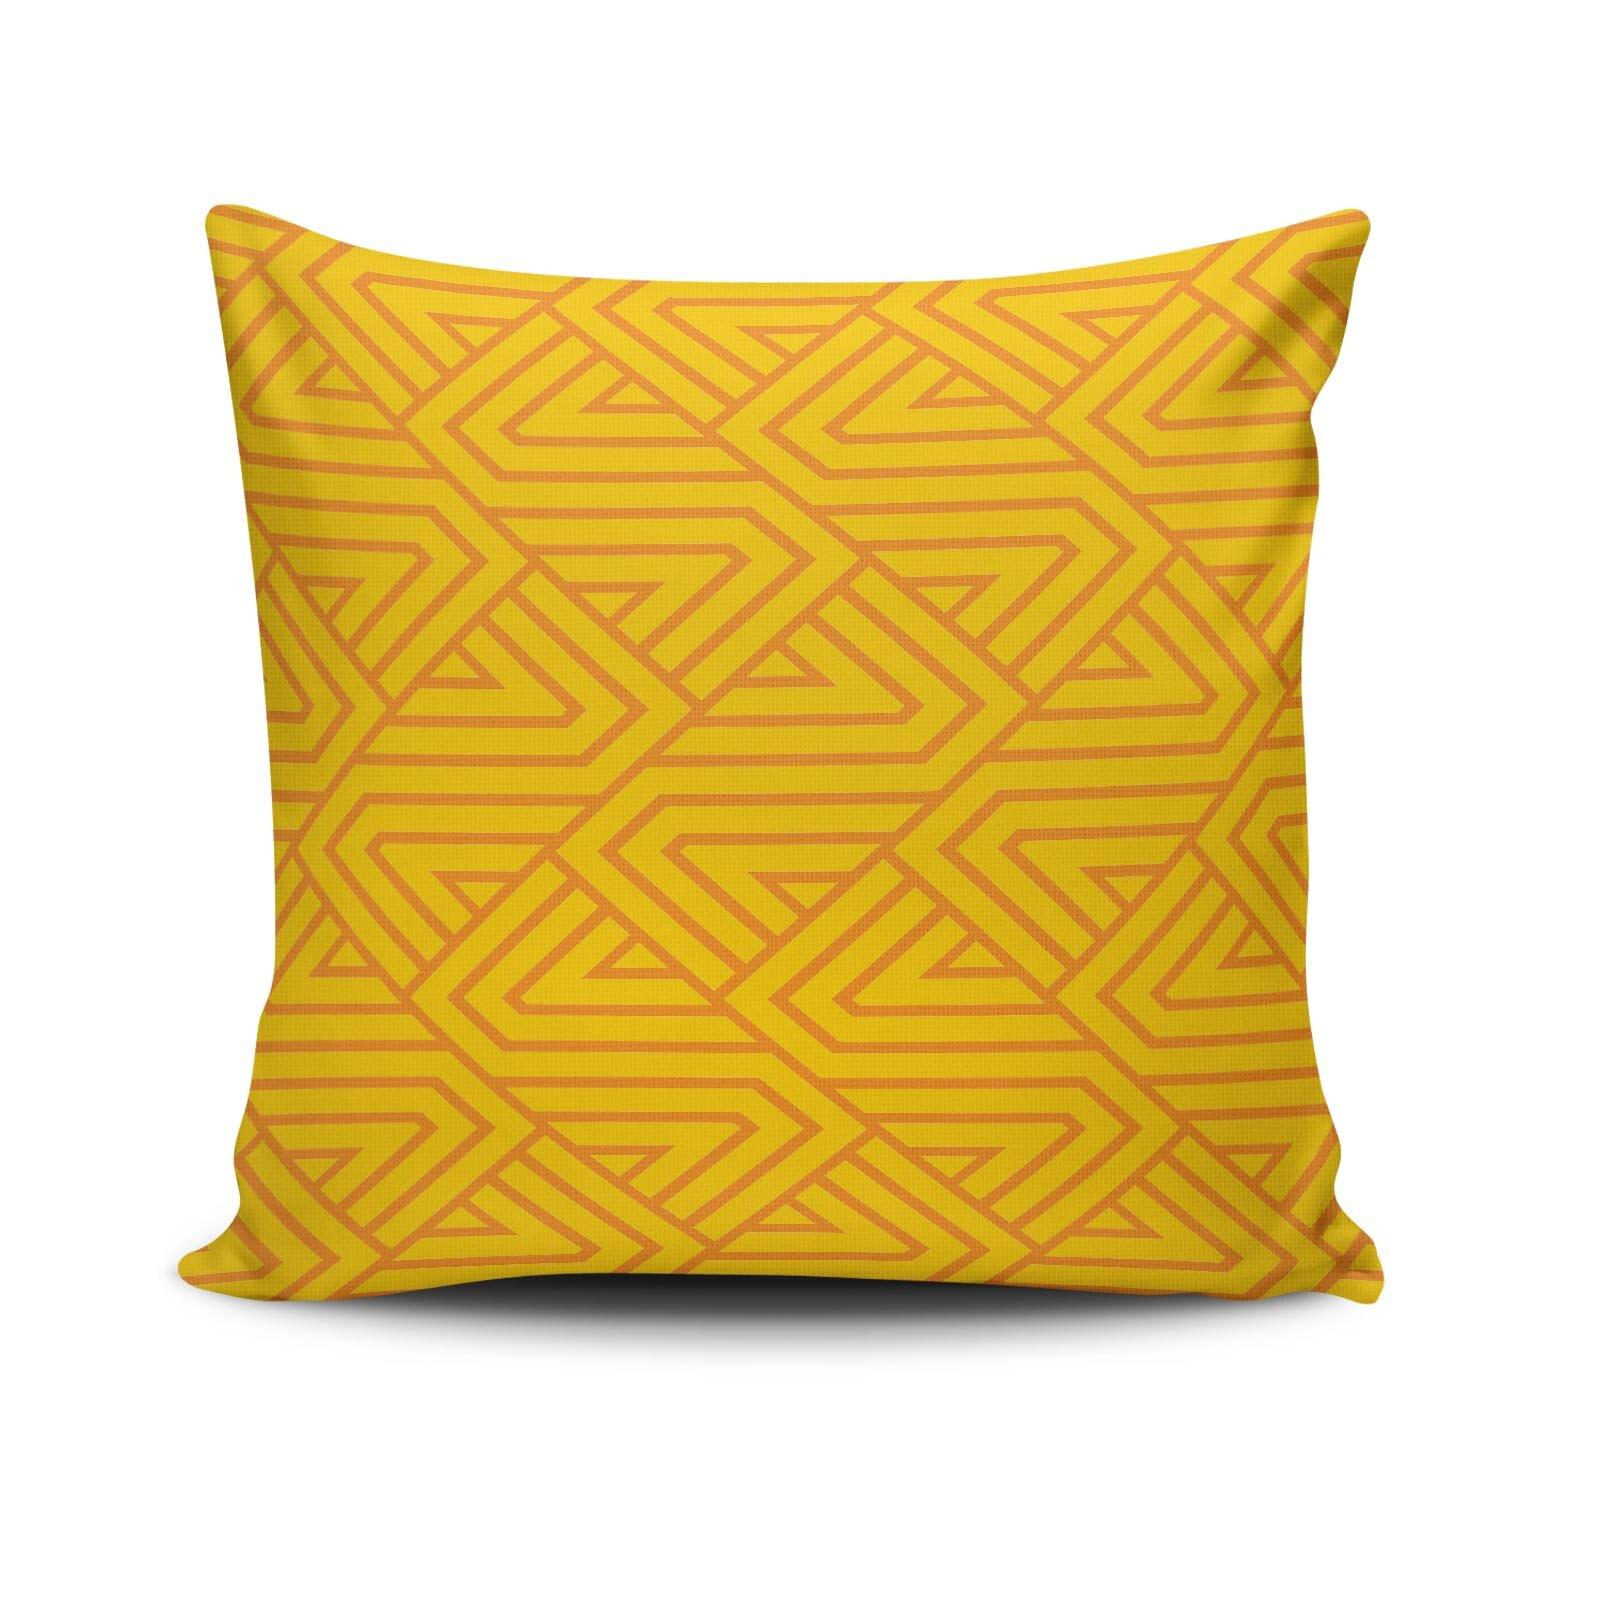 Perna decorativa Cushion Love, Dimensiune: 45 x 45 cm, Material exterior: 50% bumbac / 50% poliester 768CLV0130